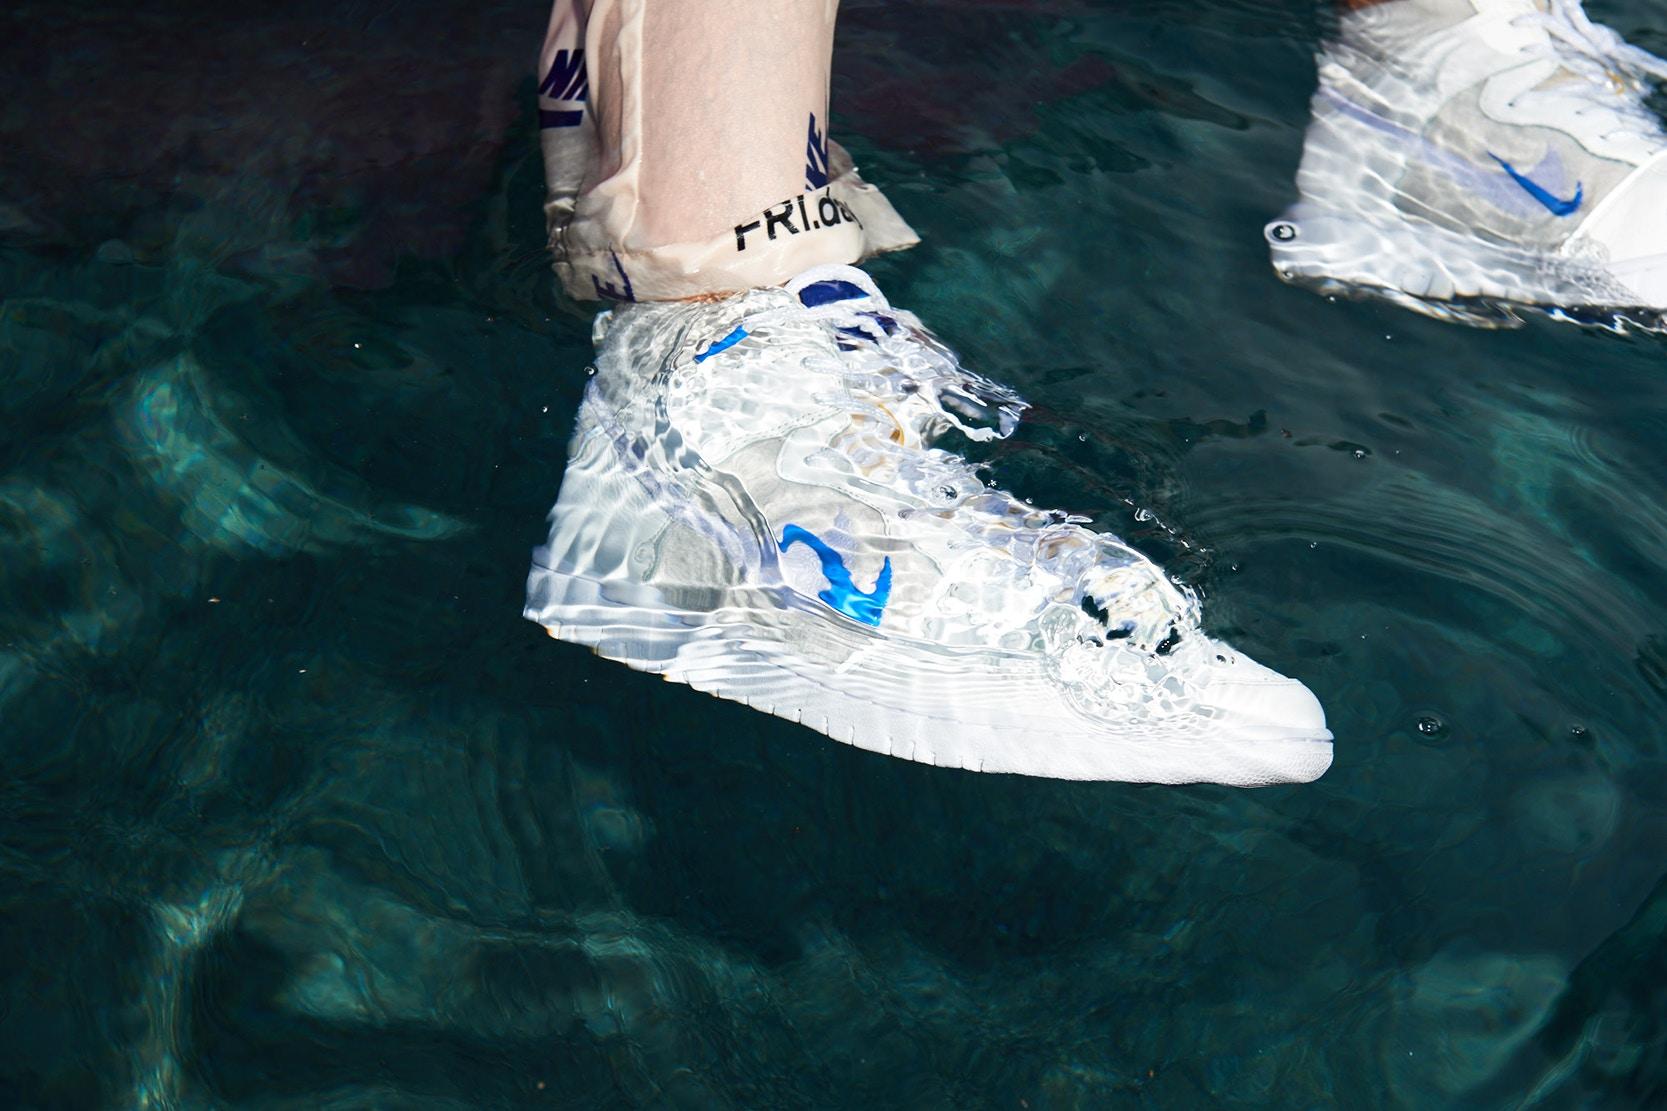 Get a Closer Look at Soulland x Nike SB's 'FRI.day Part 0.2'